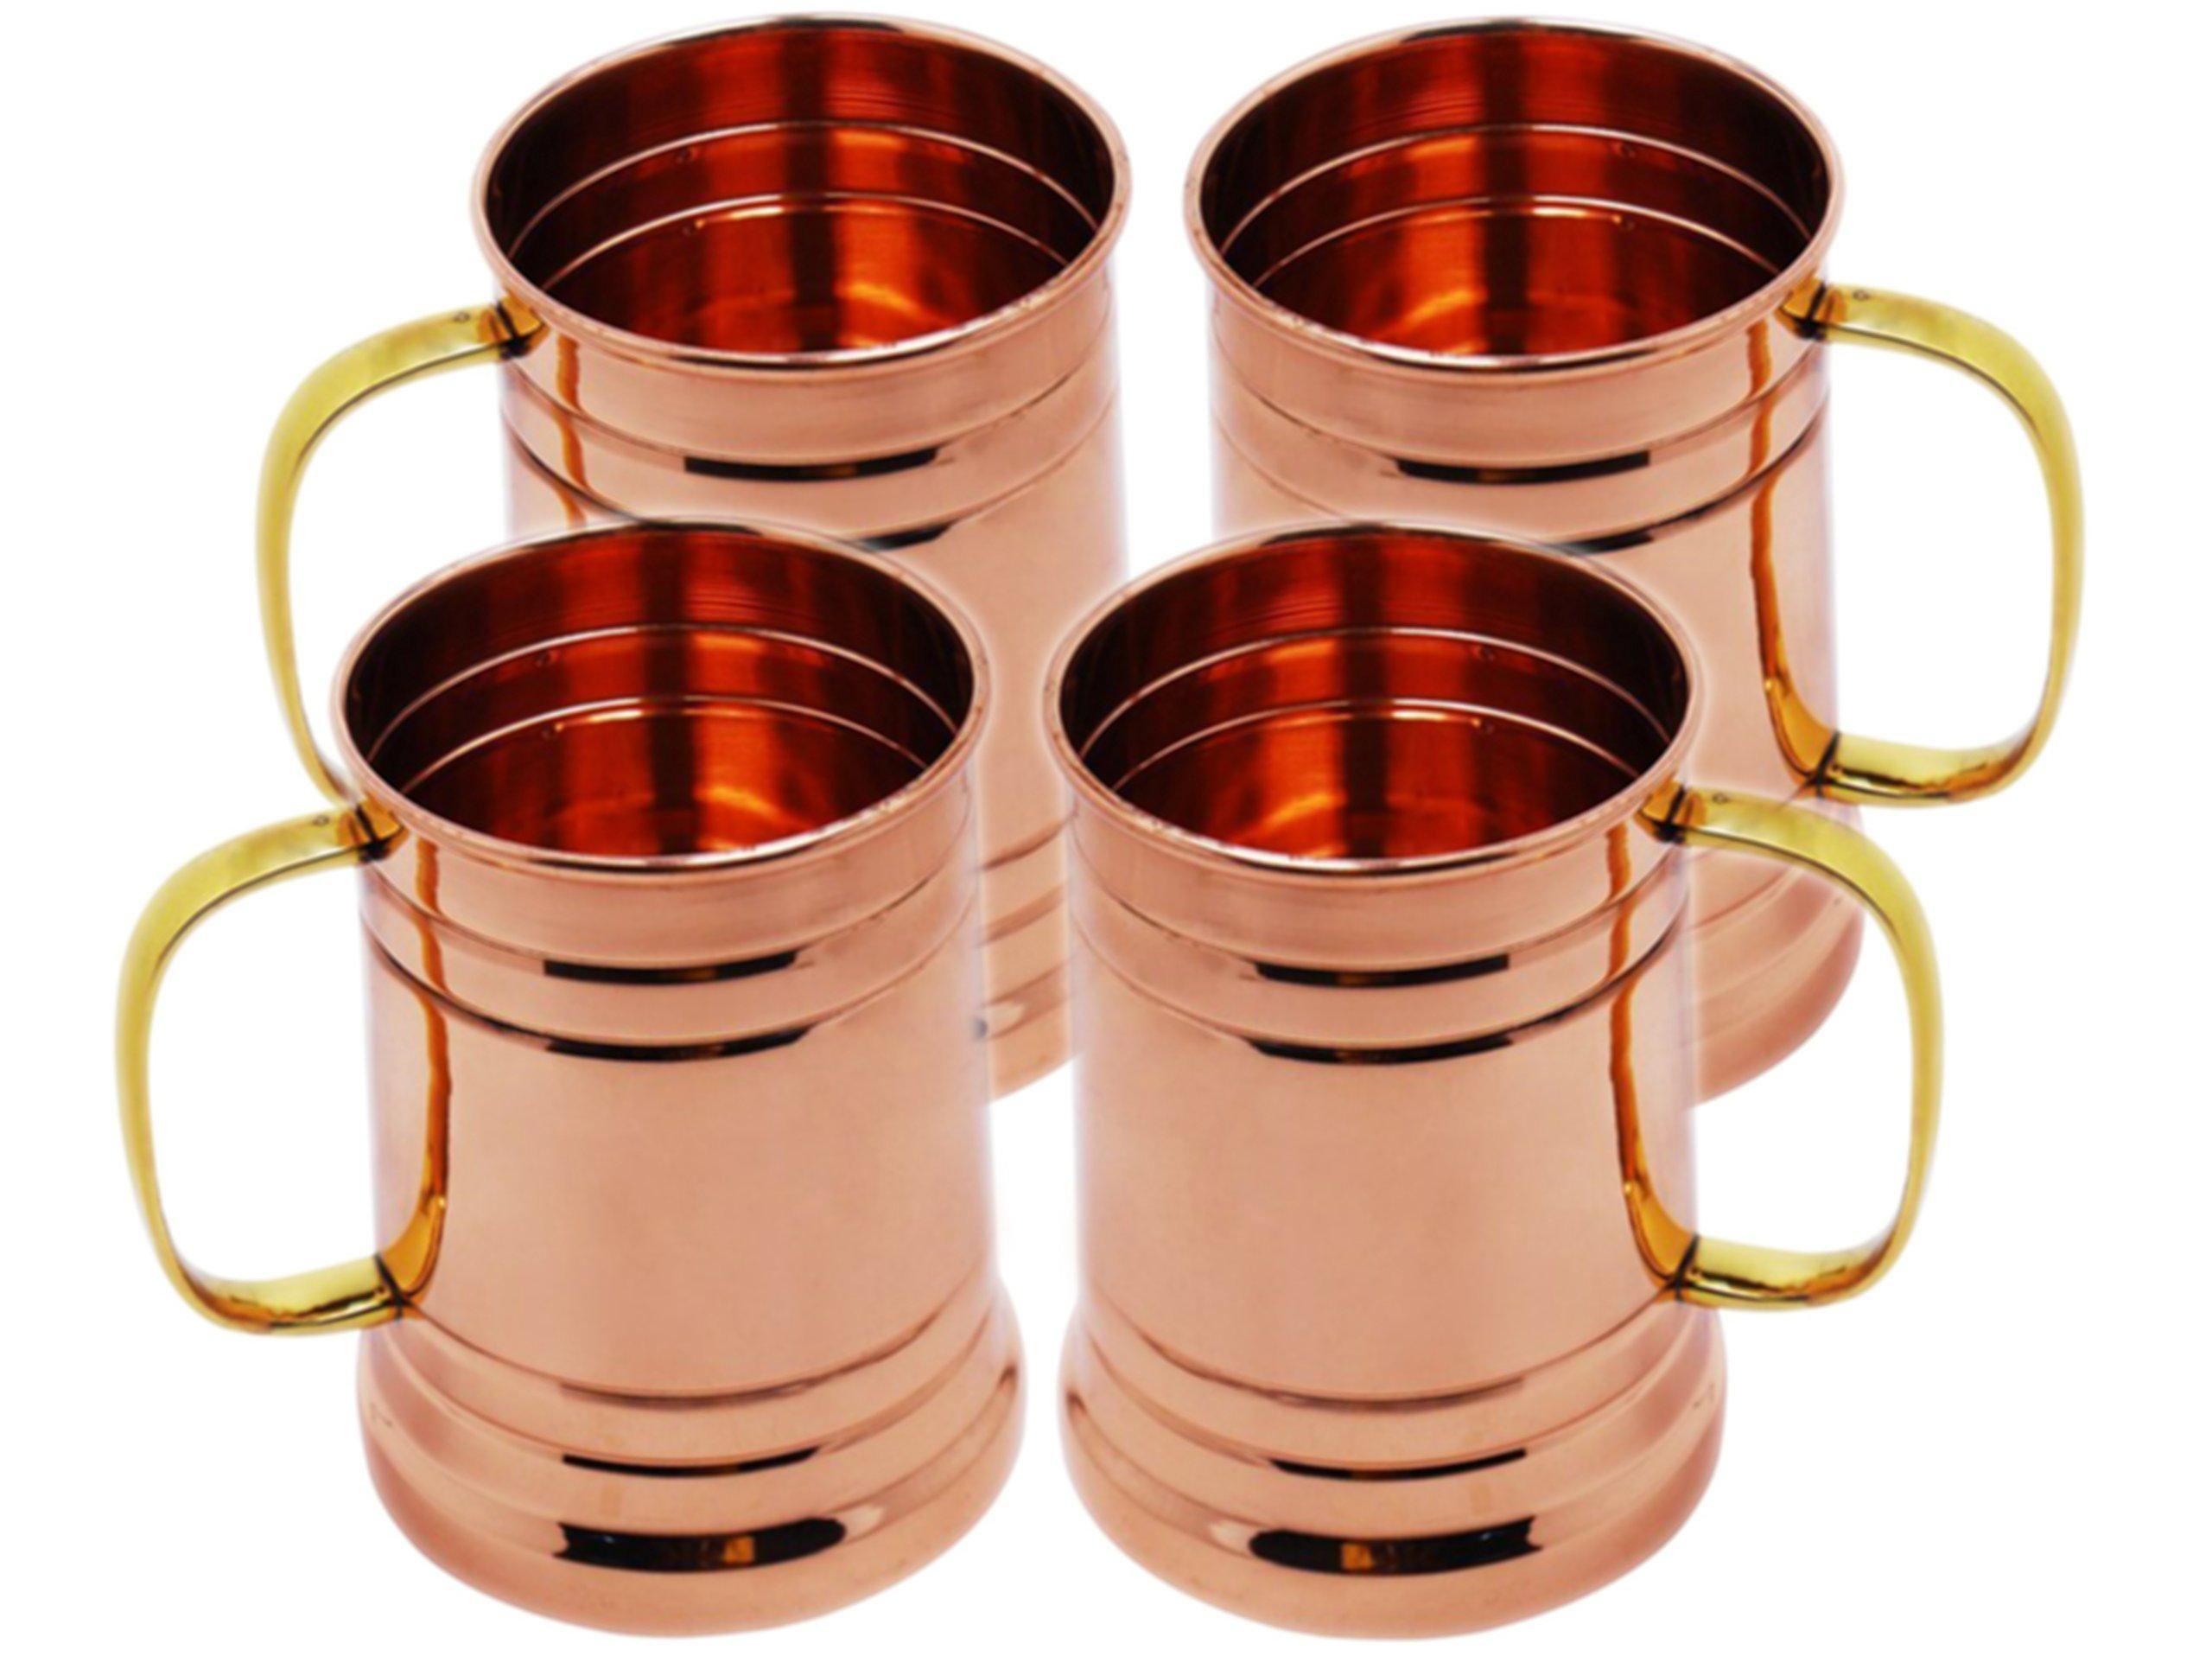 STREET CRAFT Set of 4 Copper Tankard Large Moscow Mule Mug Copper Mugs Capacity 20 Ounce